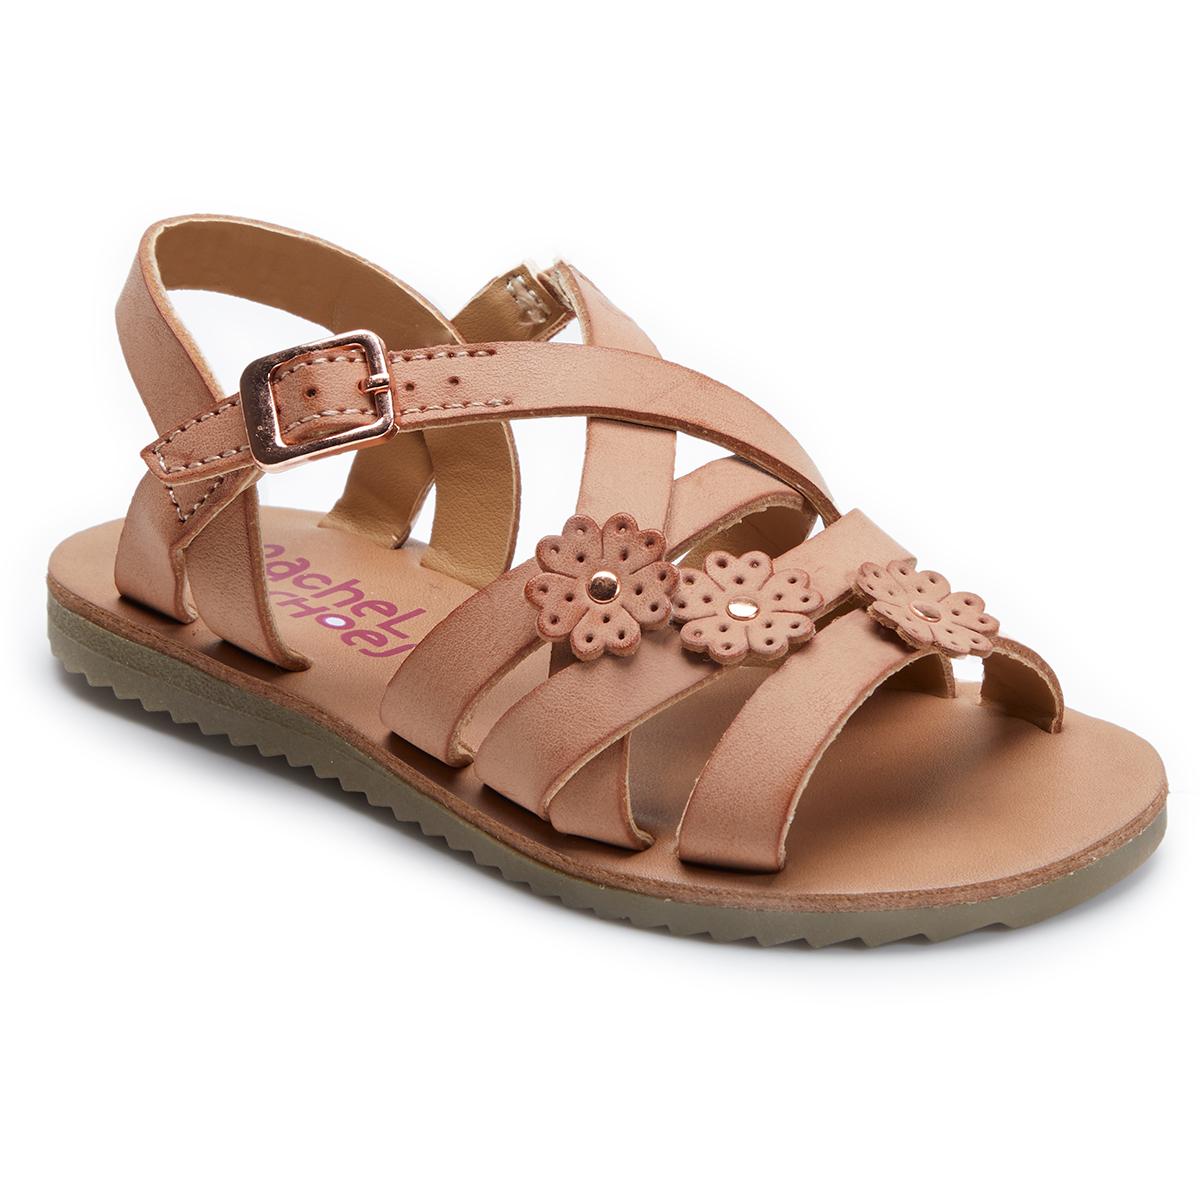 Rachel Shoes Toddler Girls' Lil Aubrey Sandal - Red, 7